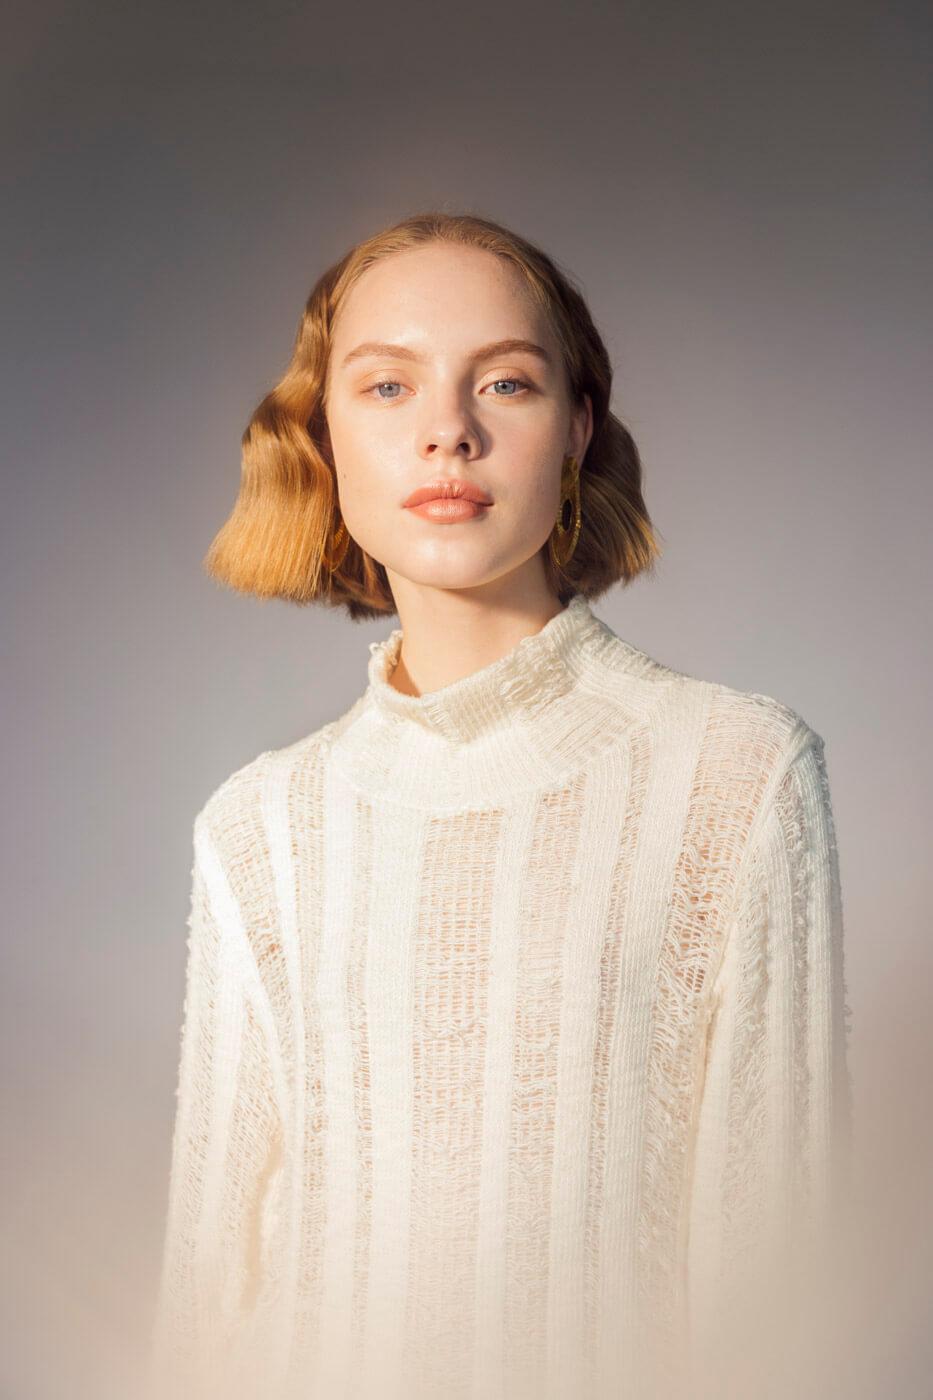 flanelle-editorial-maquillaje-peinado-moda-barcelona-1